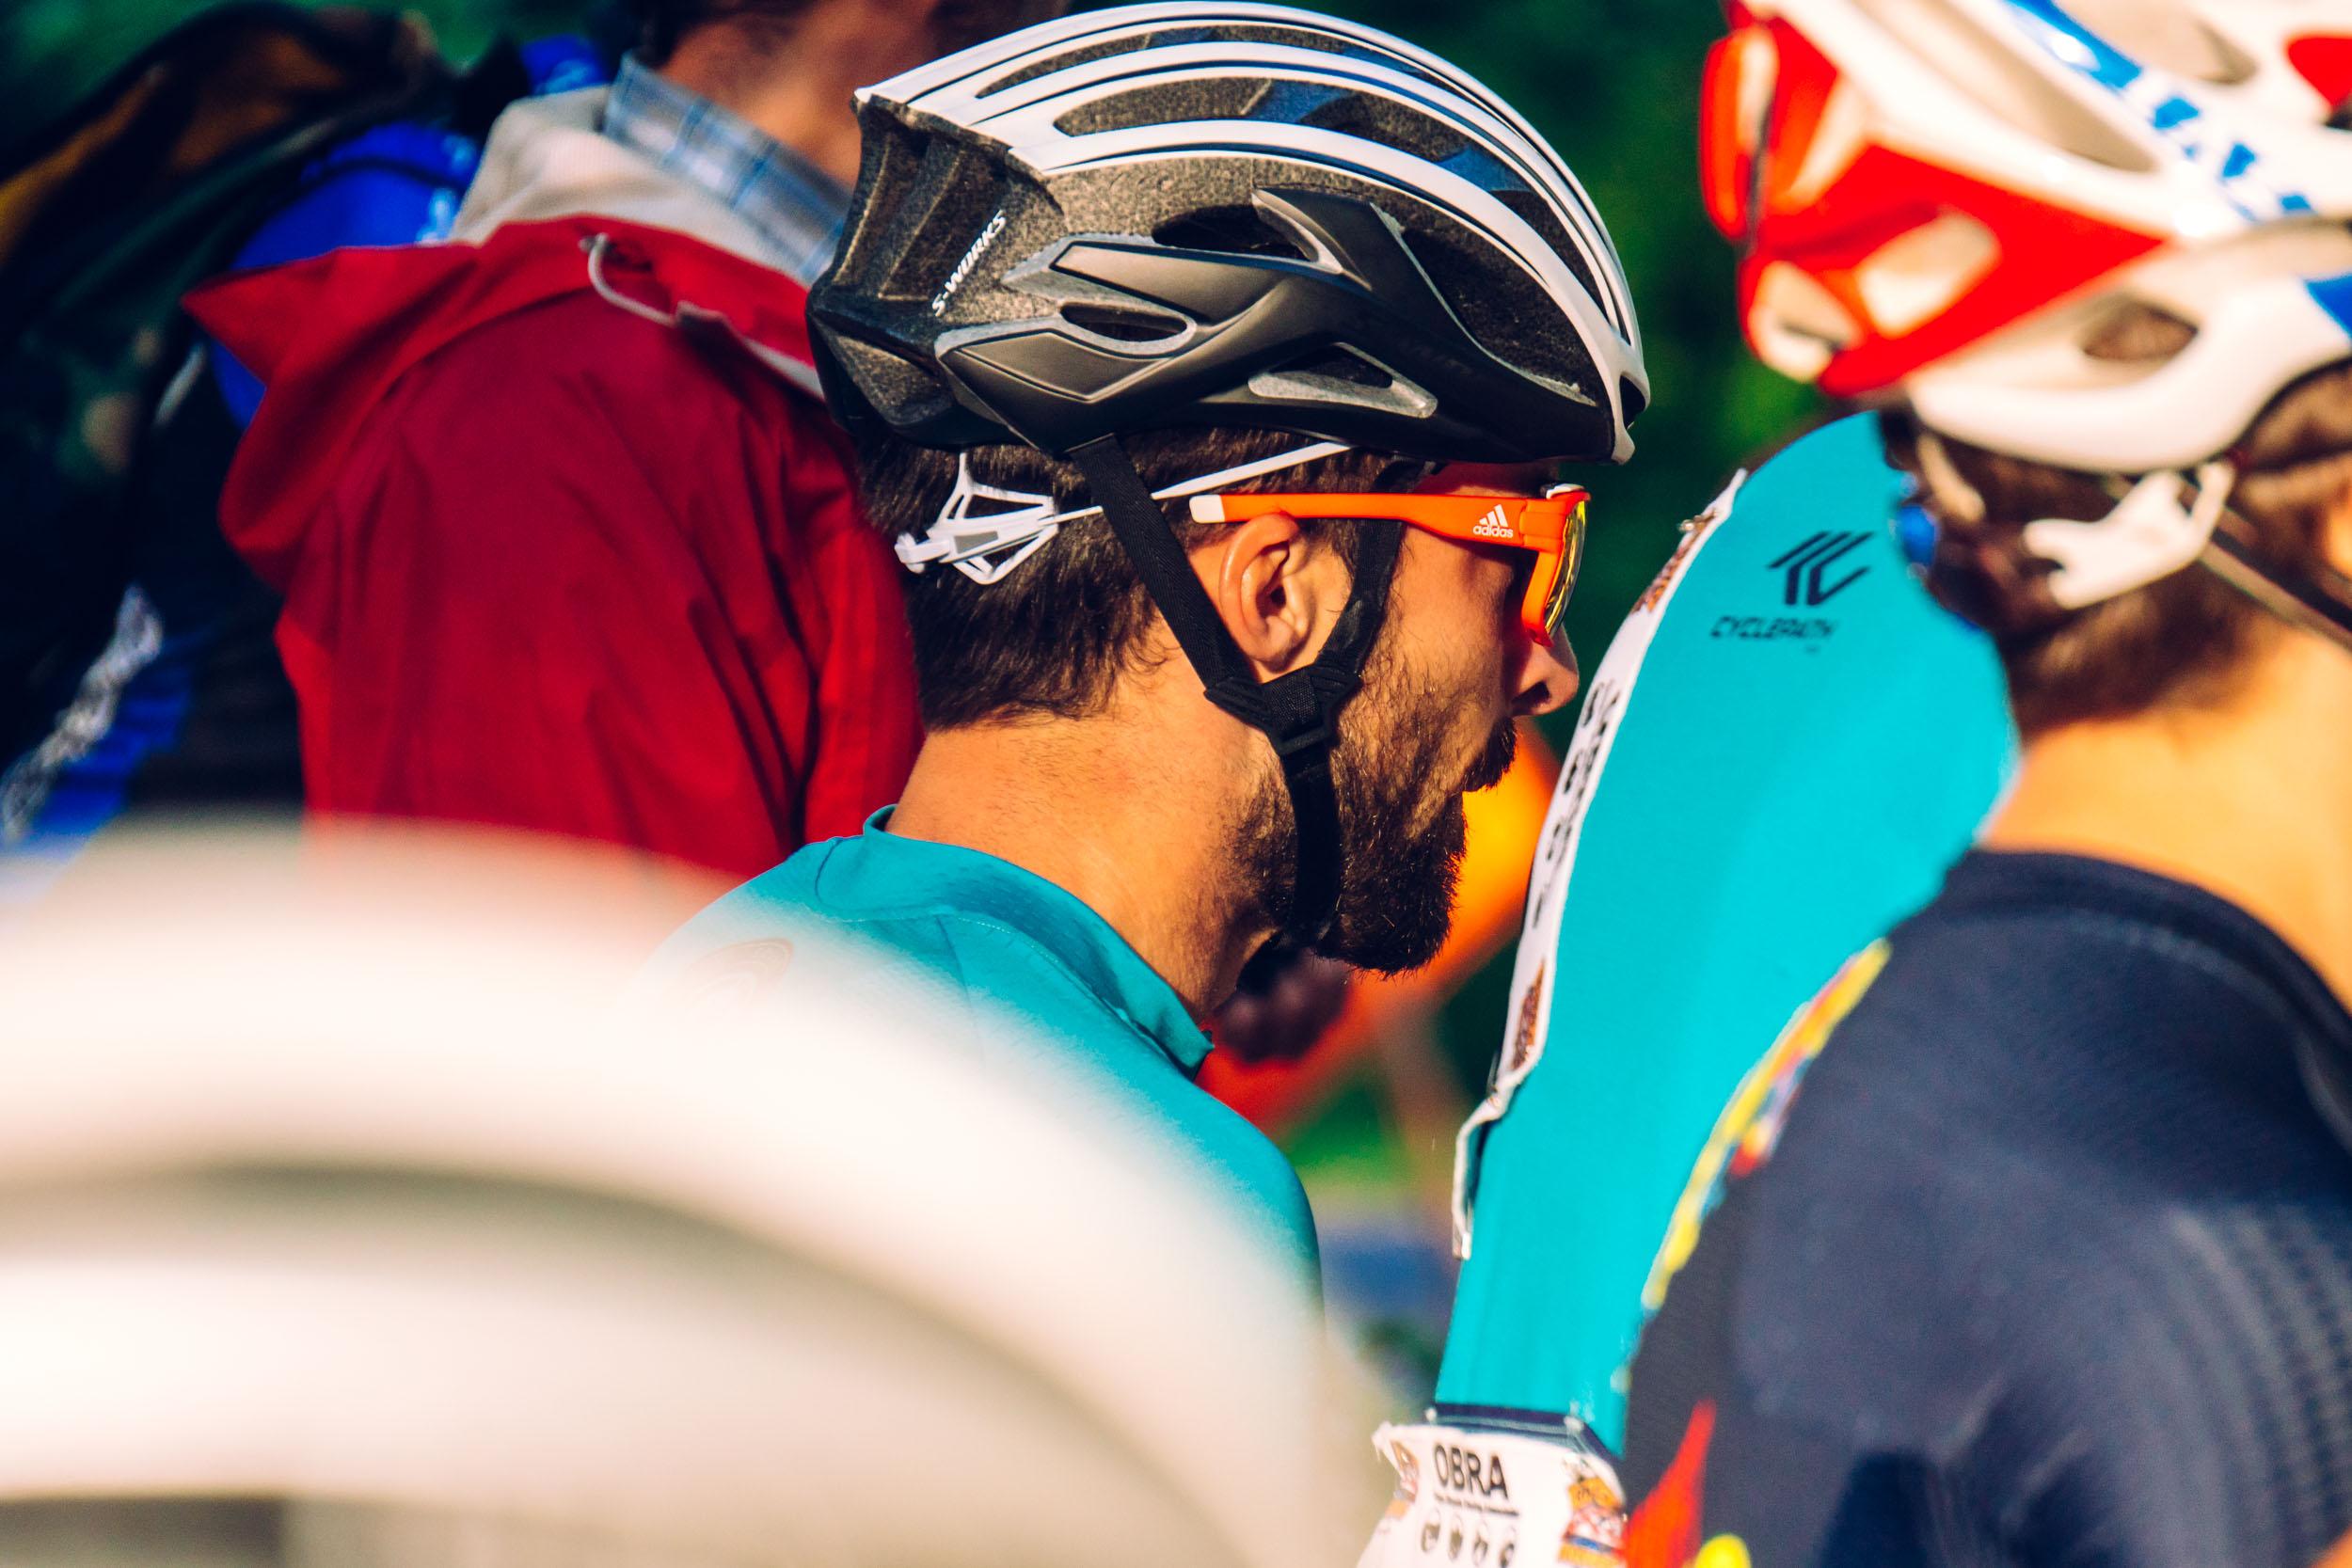 tabor_road_race_2_16.jpg